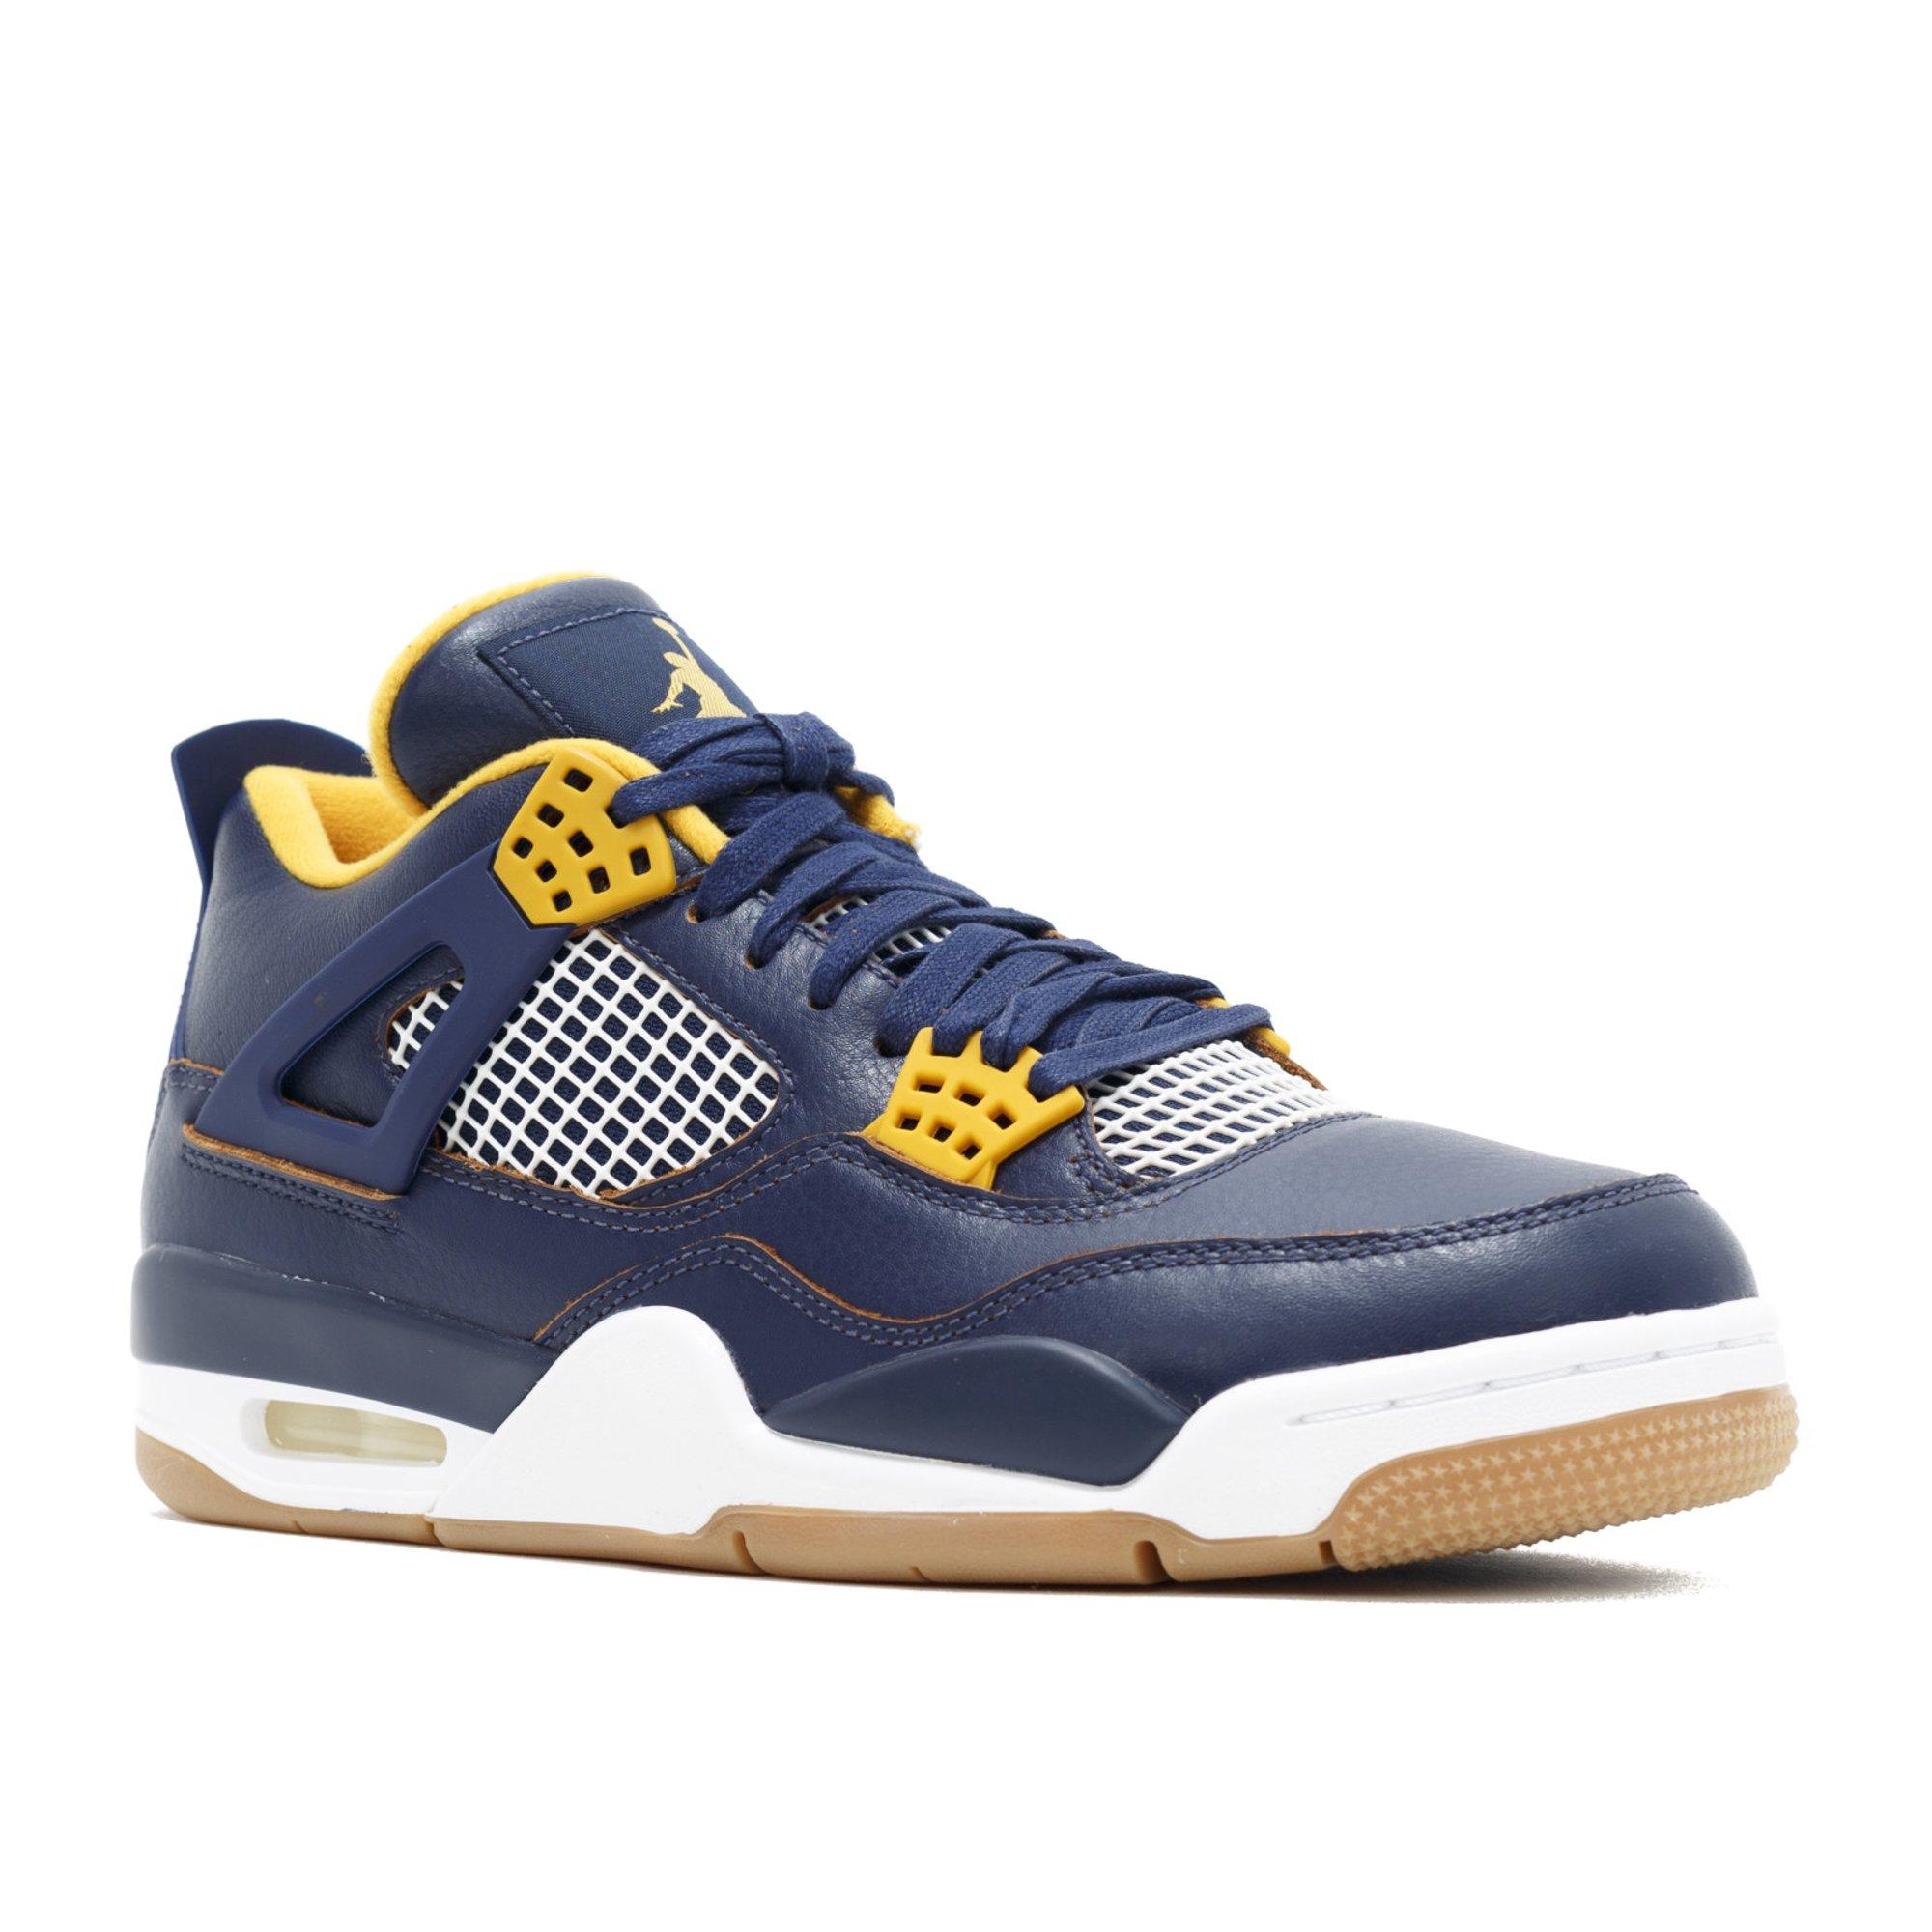 6cc50f65ab7f Air Jordan - Men - Air Jordan 4 Retro  Dunk From Above  - 308497-425 - Size  15